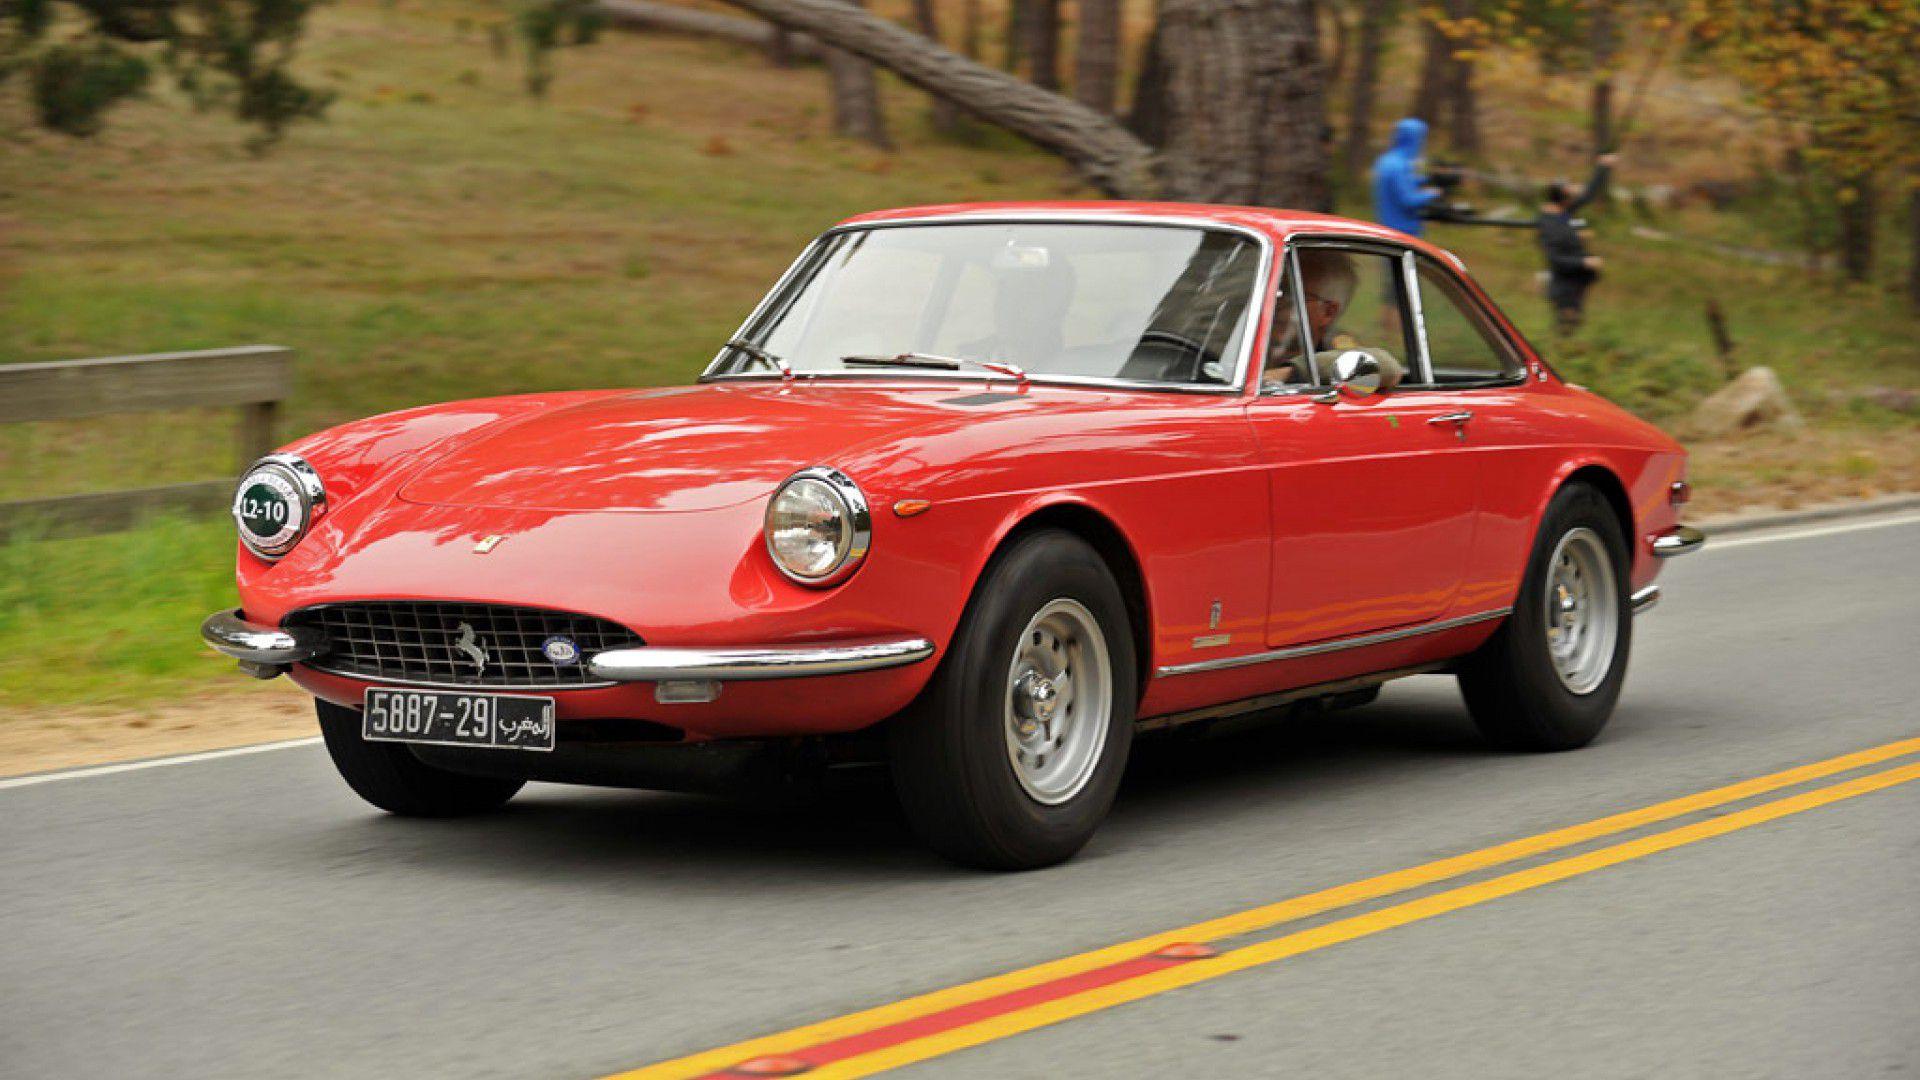 Ferrari 365 GTC Coupe